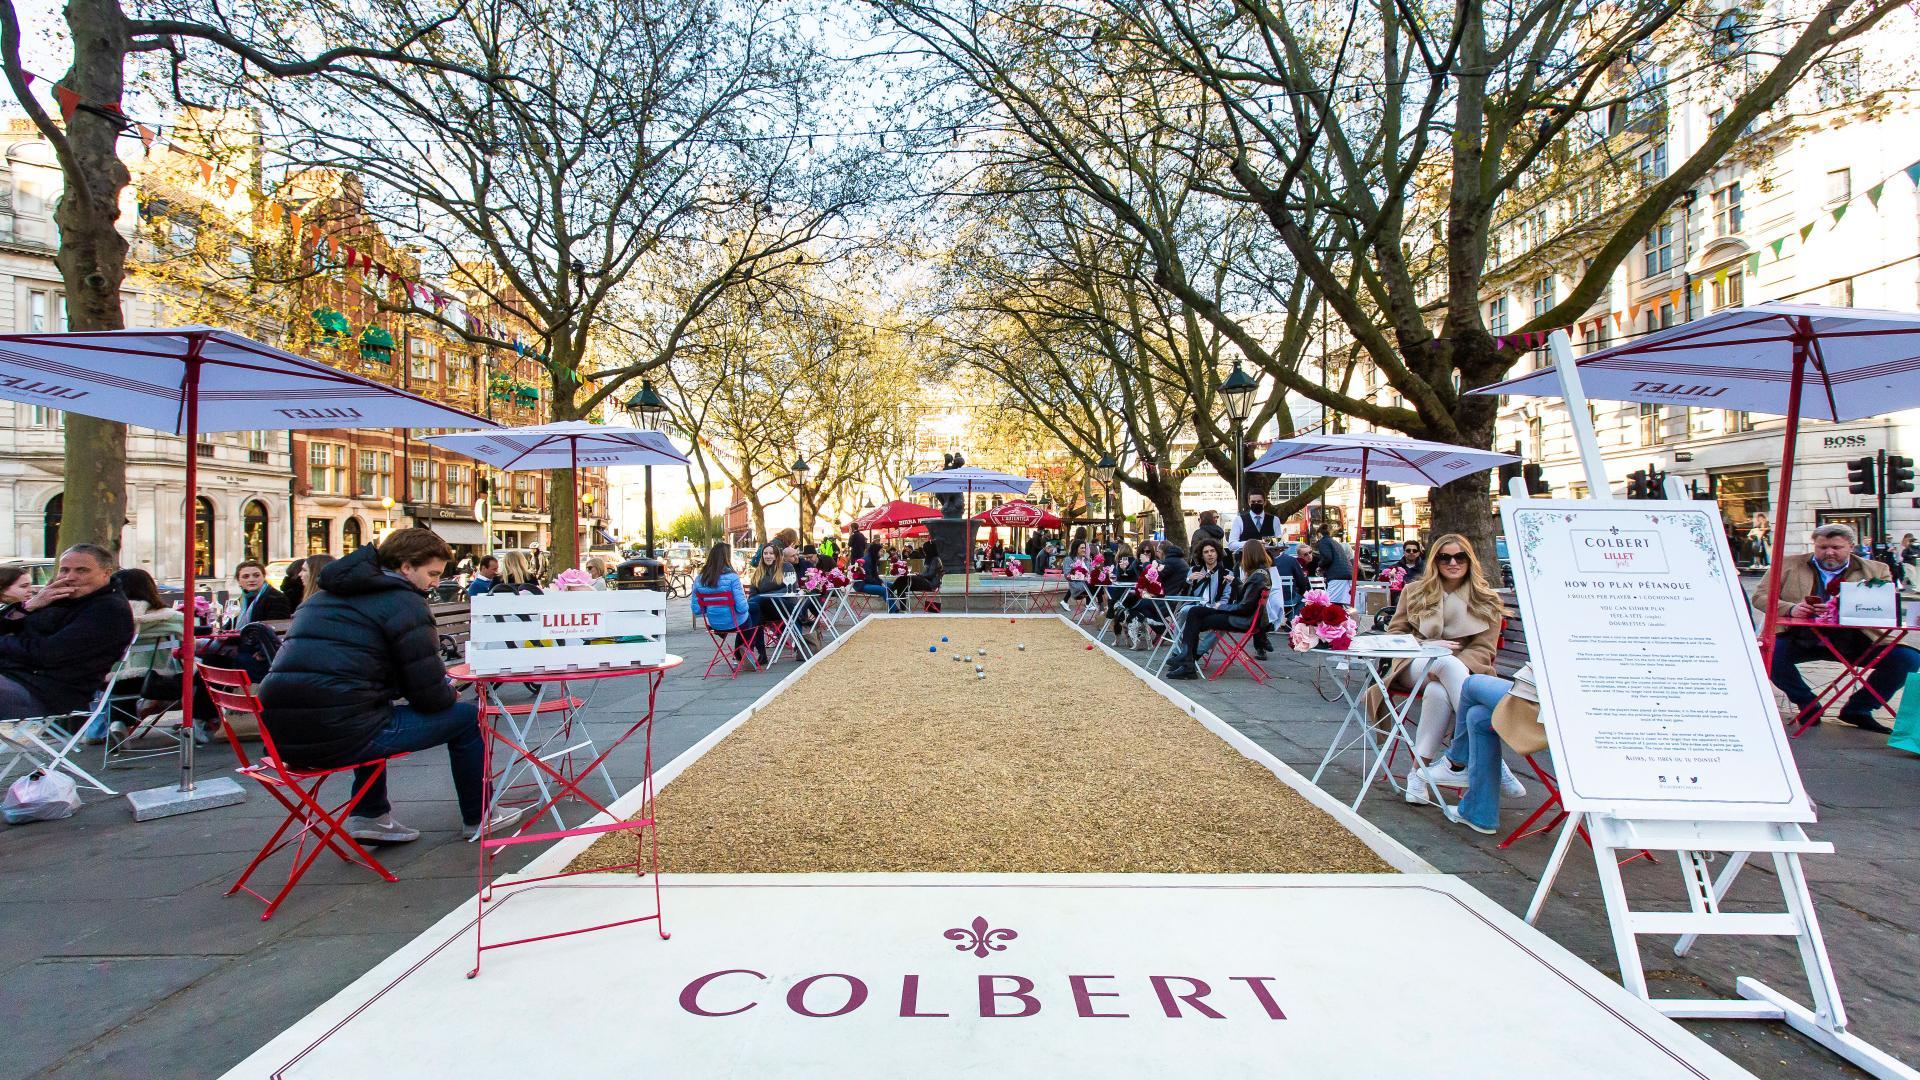 Summer events London 2021: Lillet terrace at Colbert